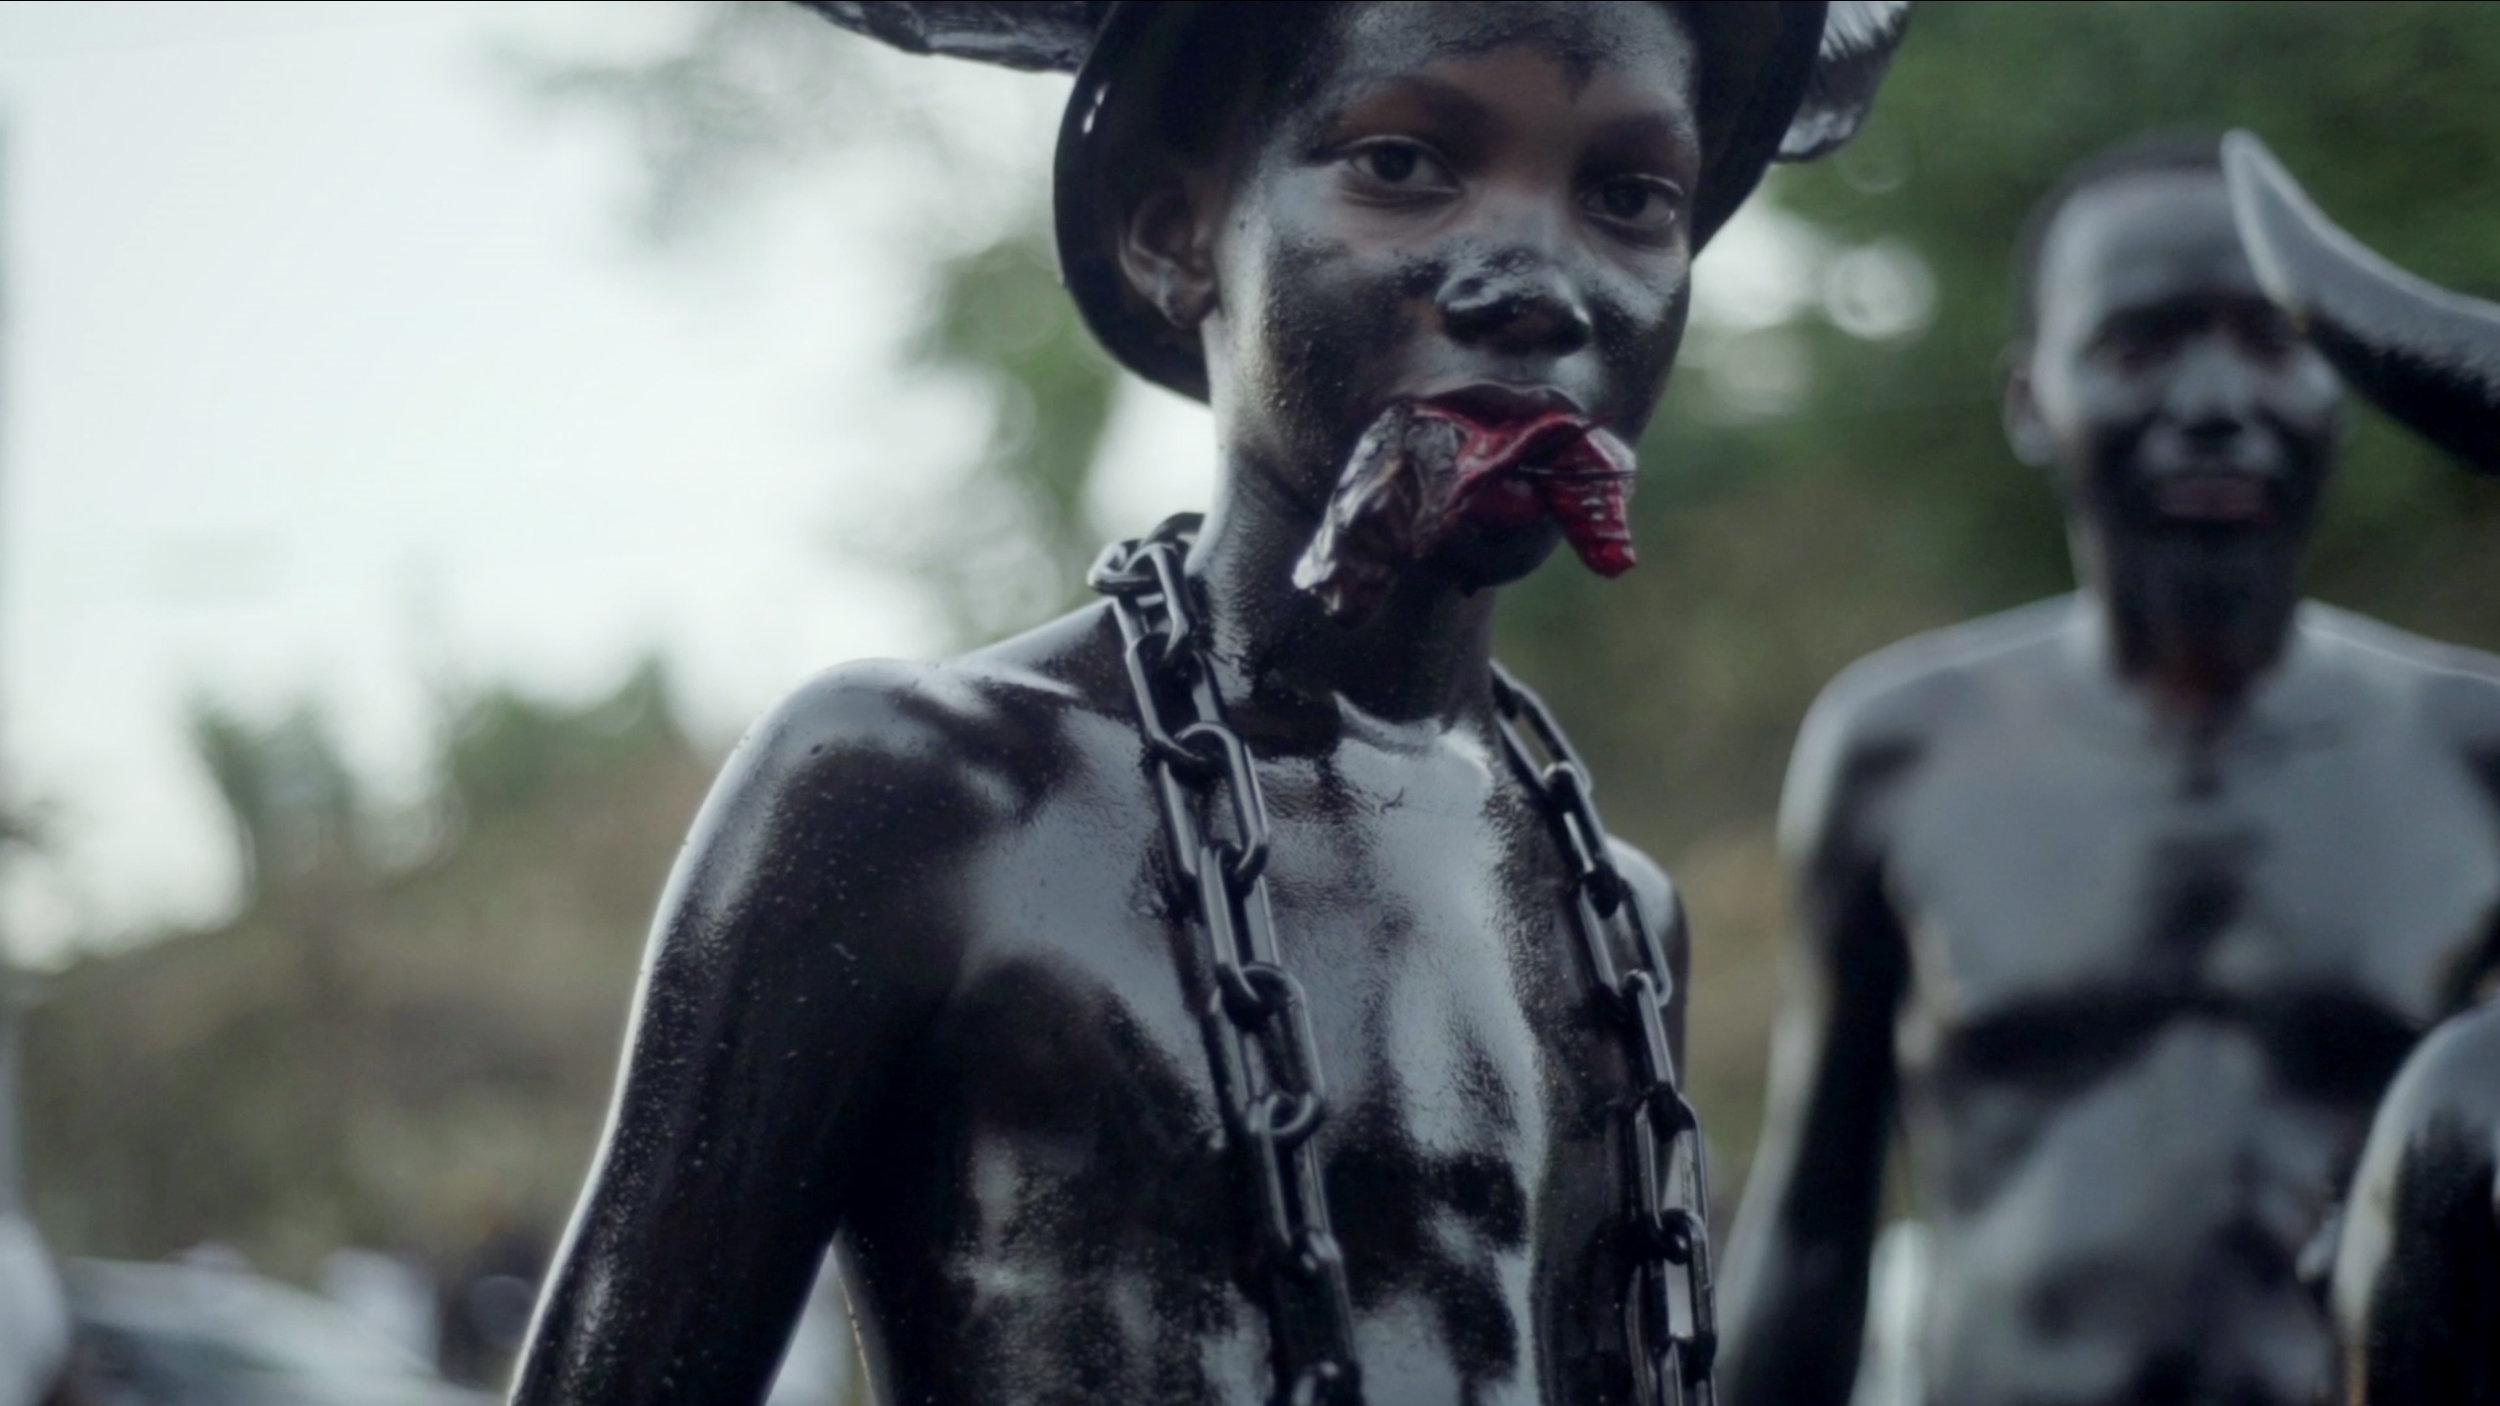 Jab Jab |  Directed by Thomas Harrad (Grenada, 2019, 5 min)